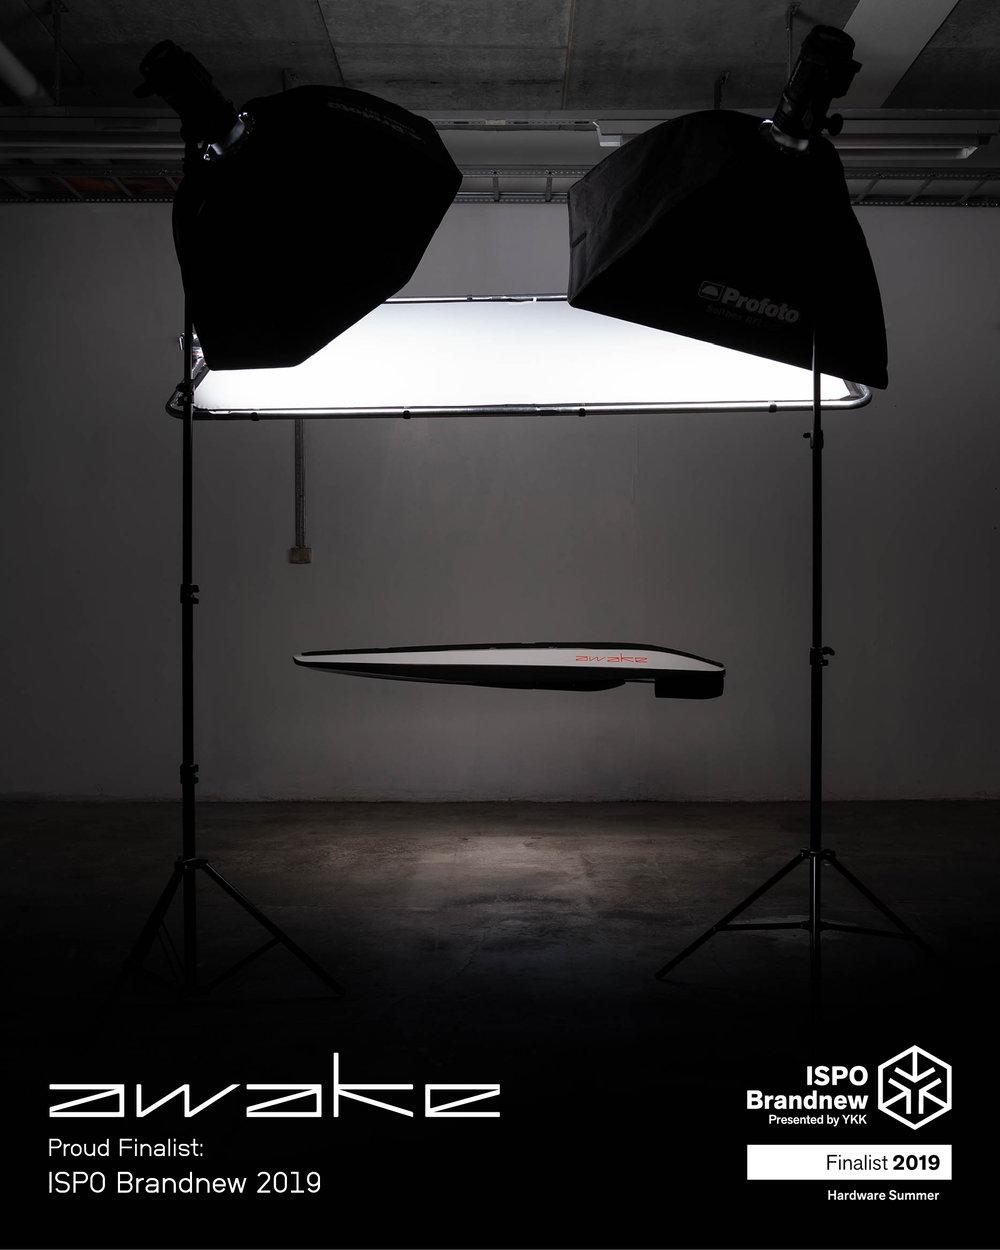 Awake RÄVIK electric surfboard finalists